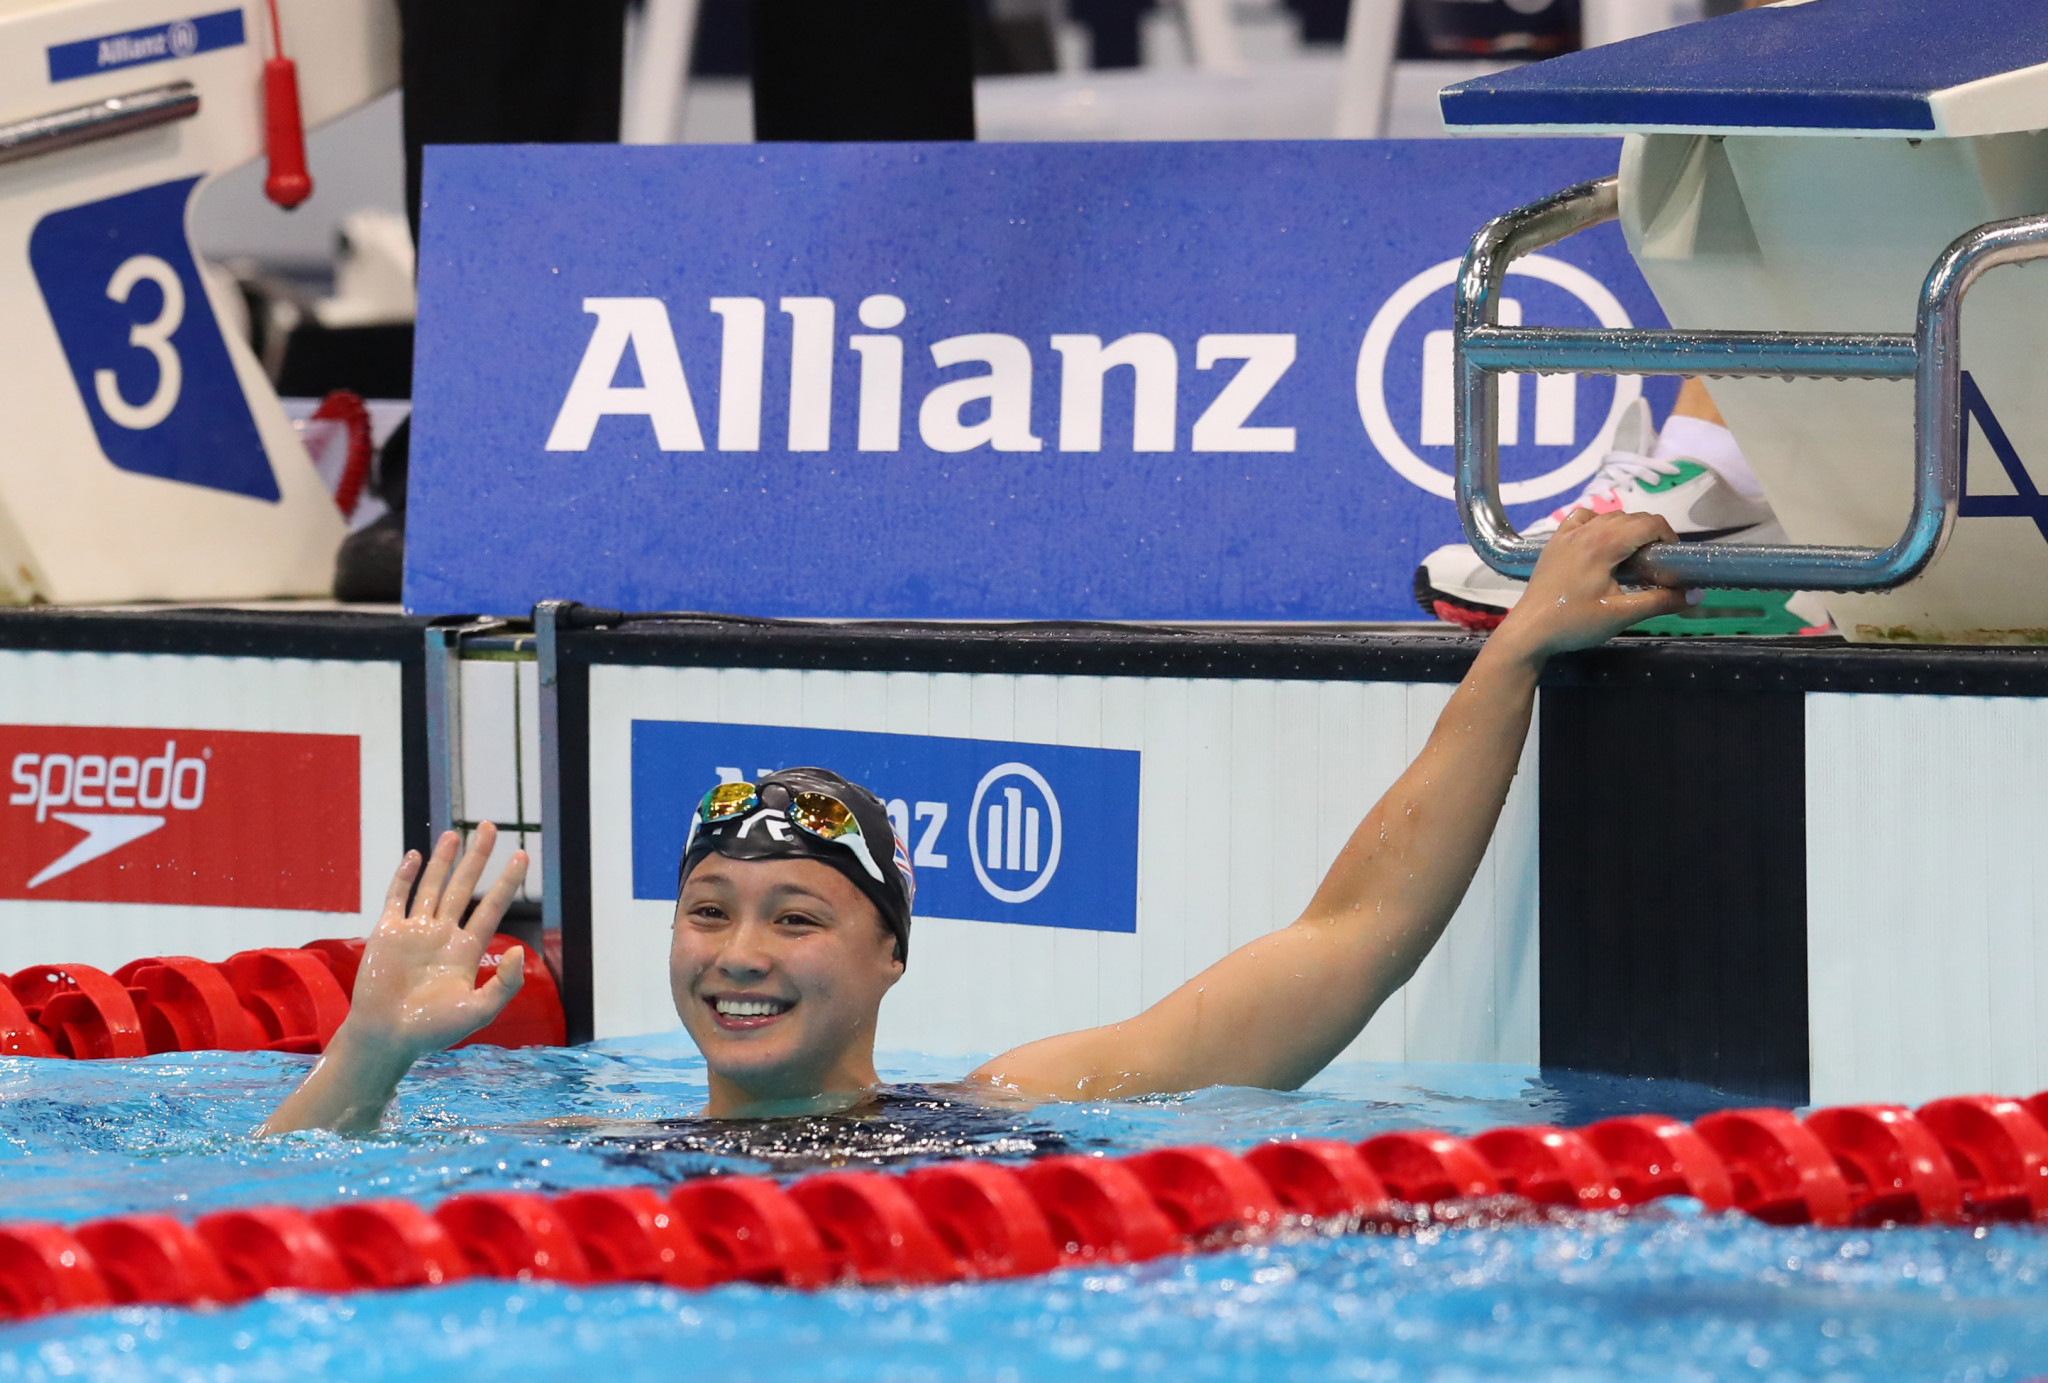 Para-swimming world champions Tai and Barlaam share lockdown experiences